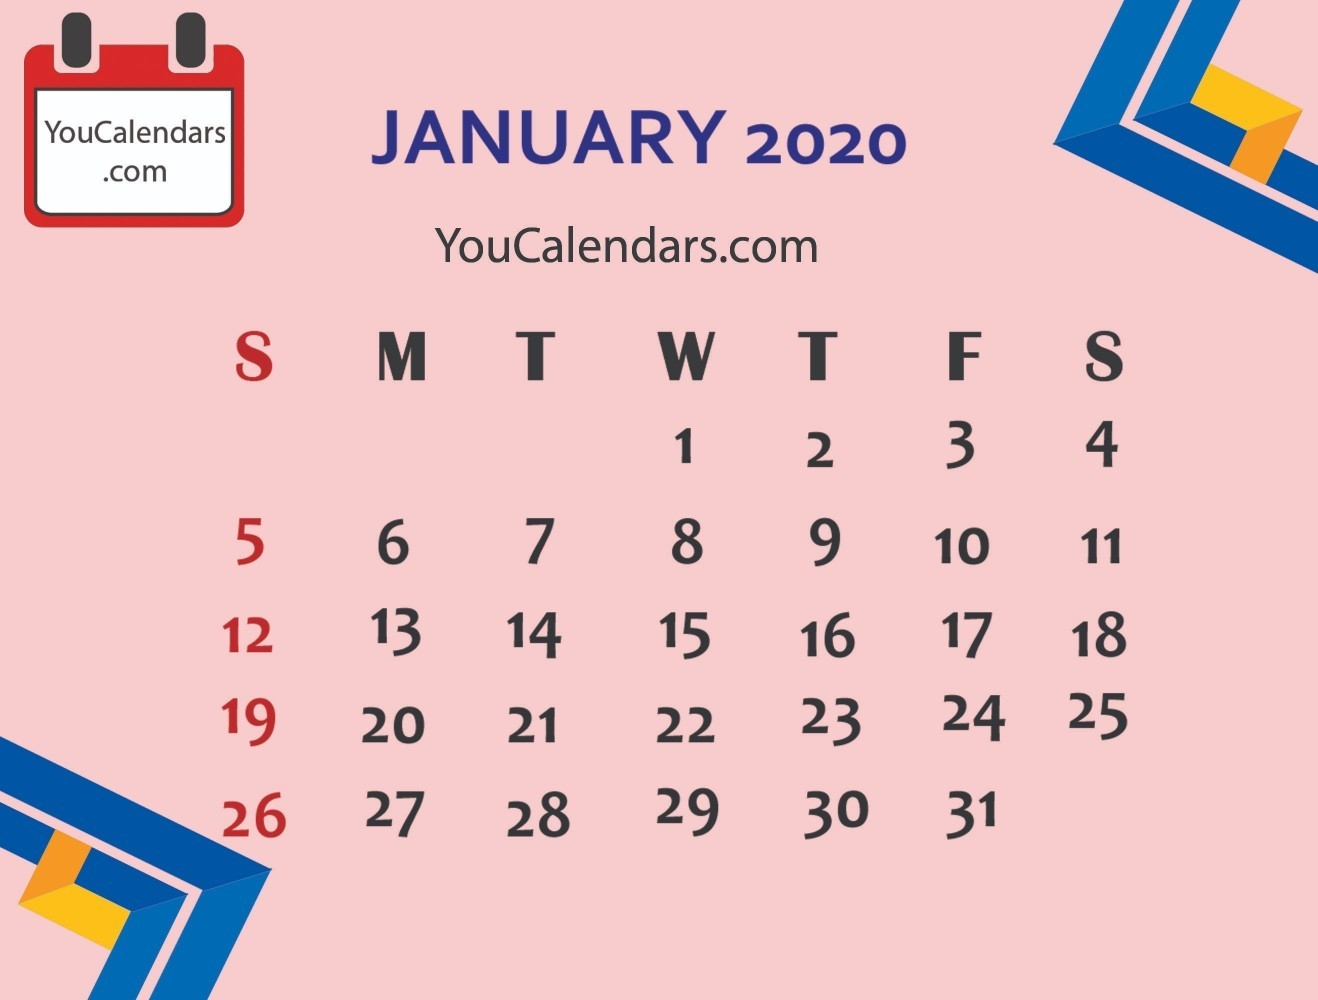 ✅Free January 2020 Calendar Printable Template - You Calendars-Cute January 2020 Calendar